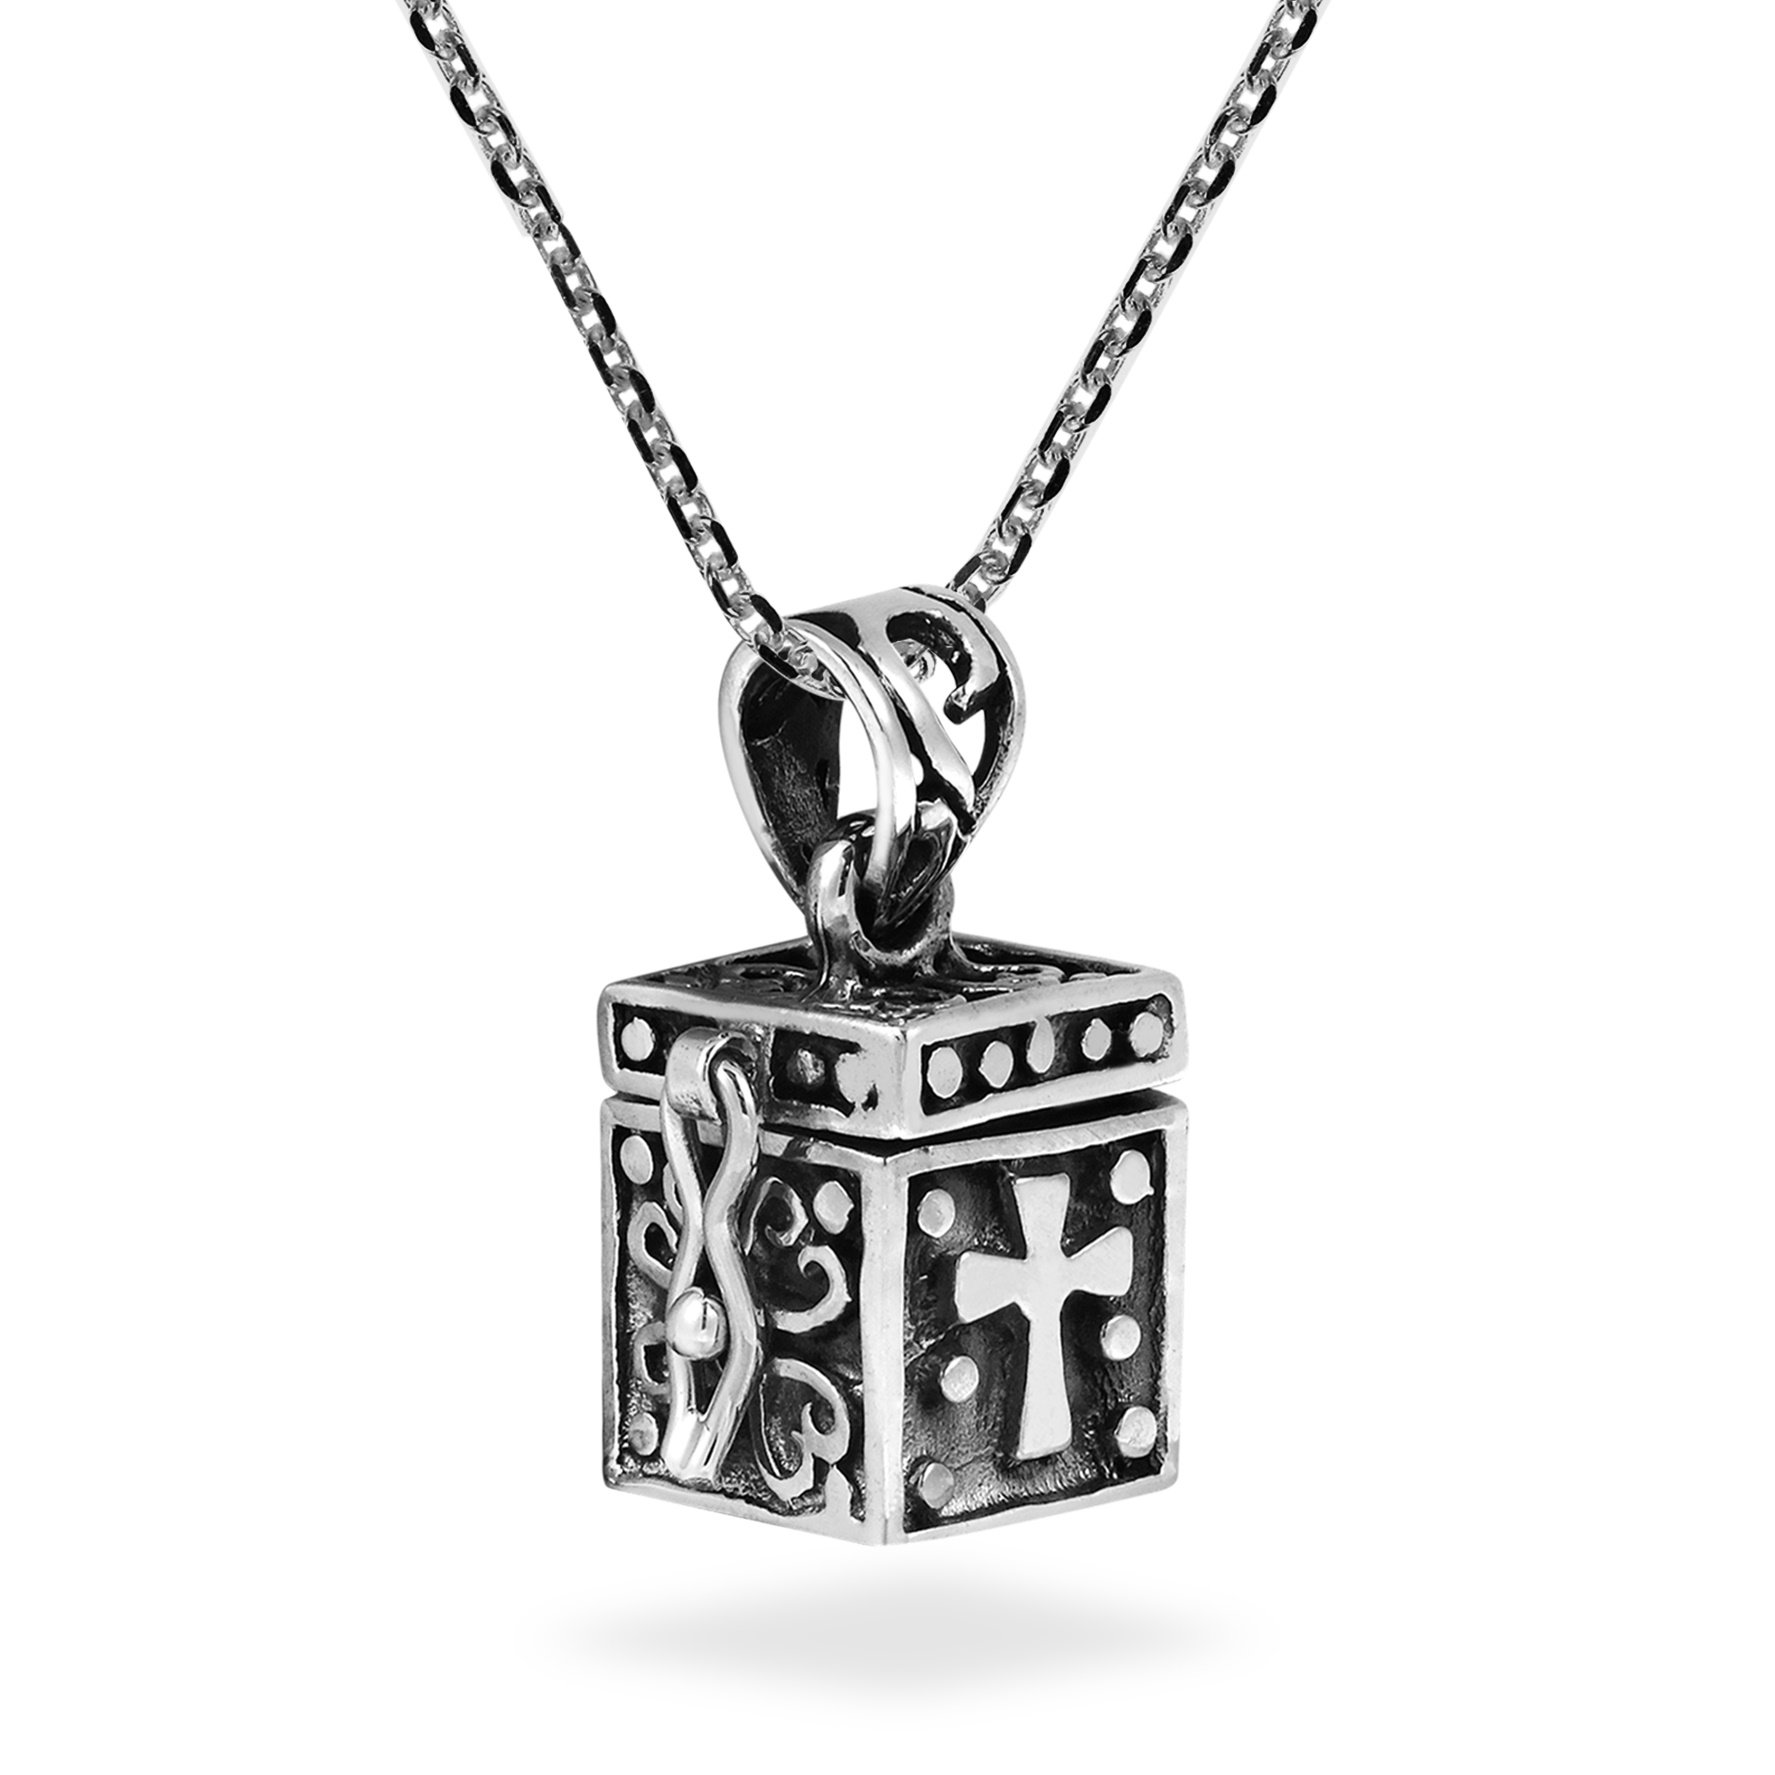 AeraVida Christian Prayer Box Locket .925 Sterling Silver Pendant Necklace by AeraVida